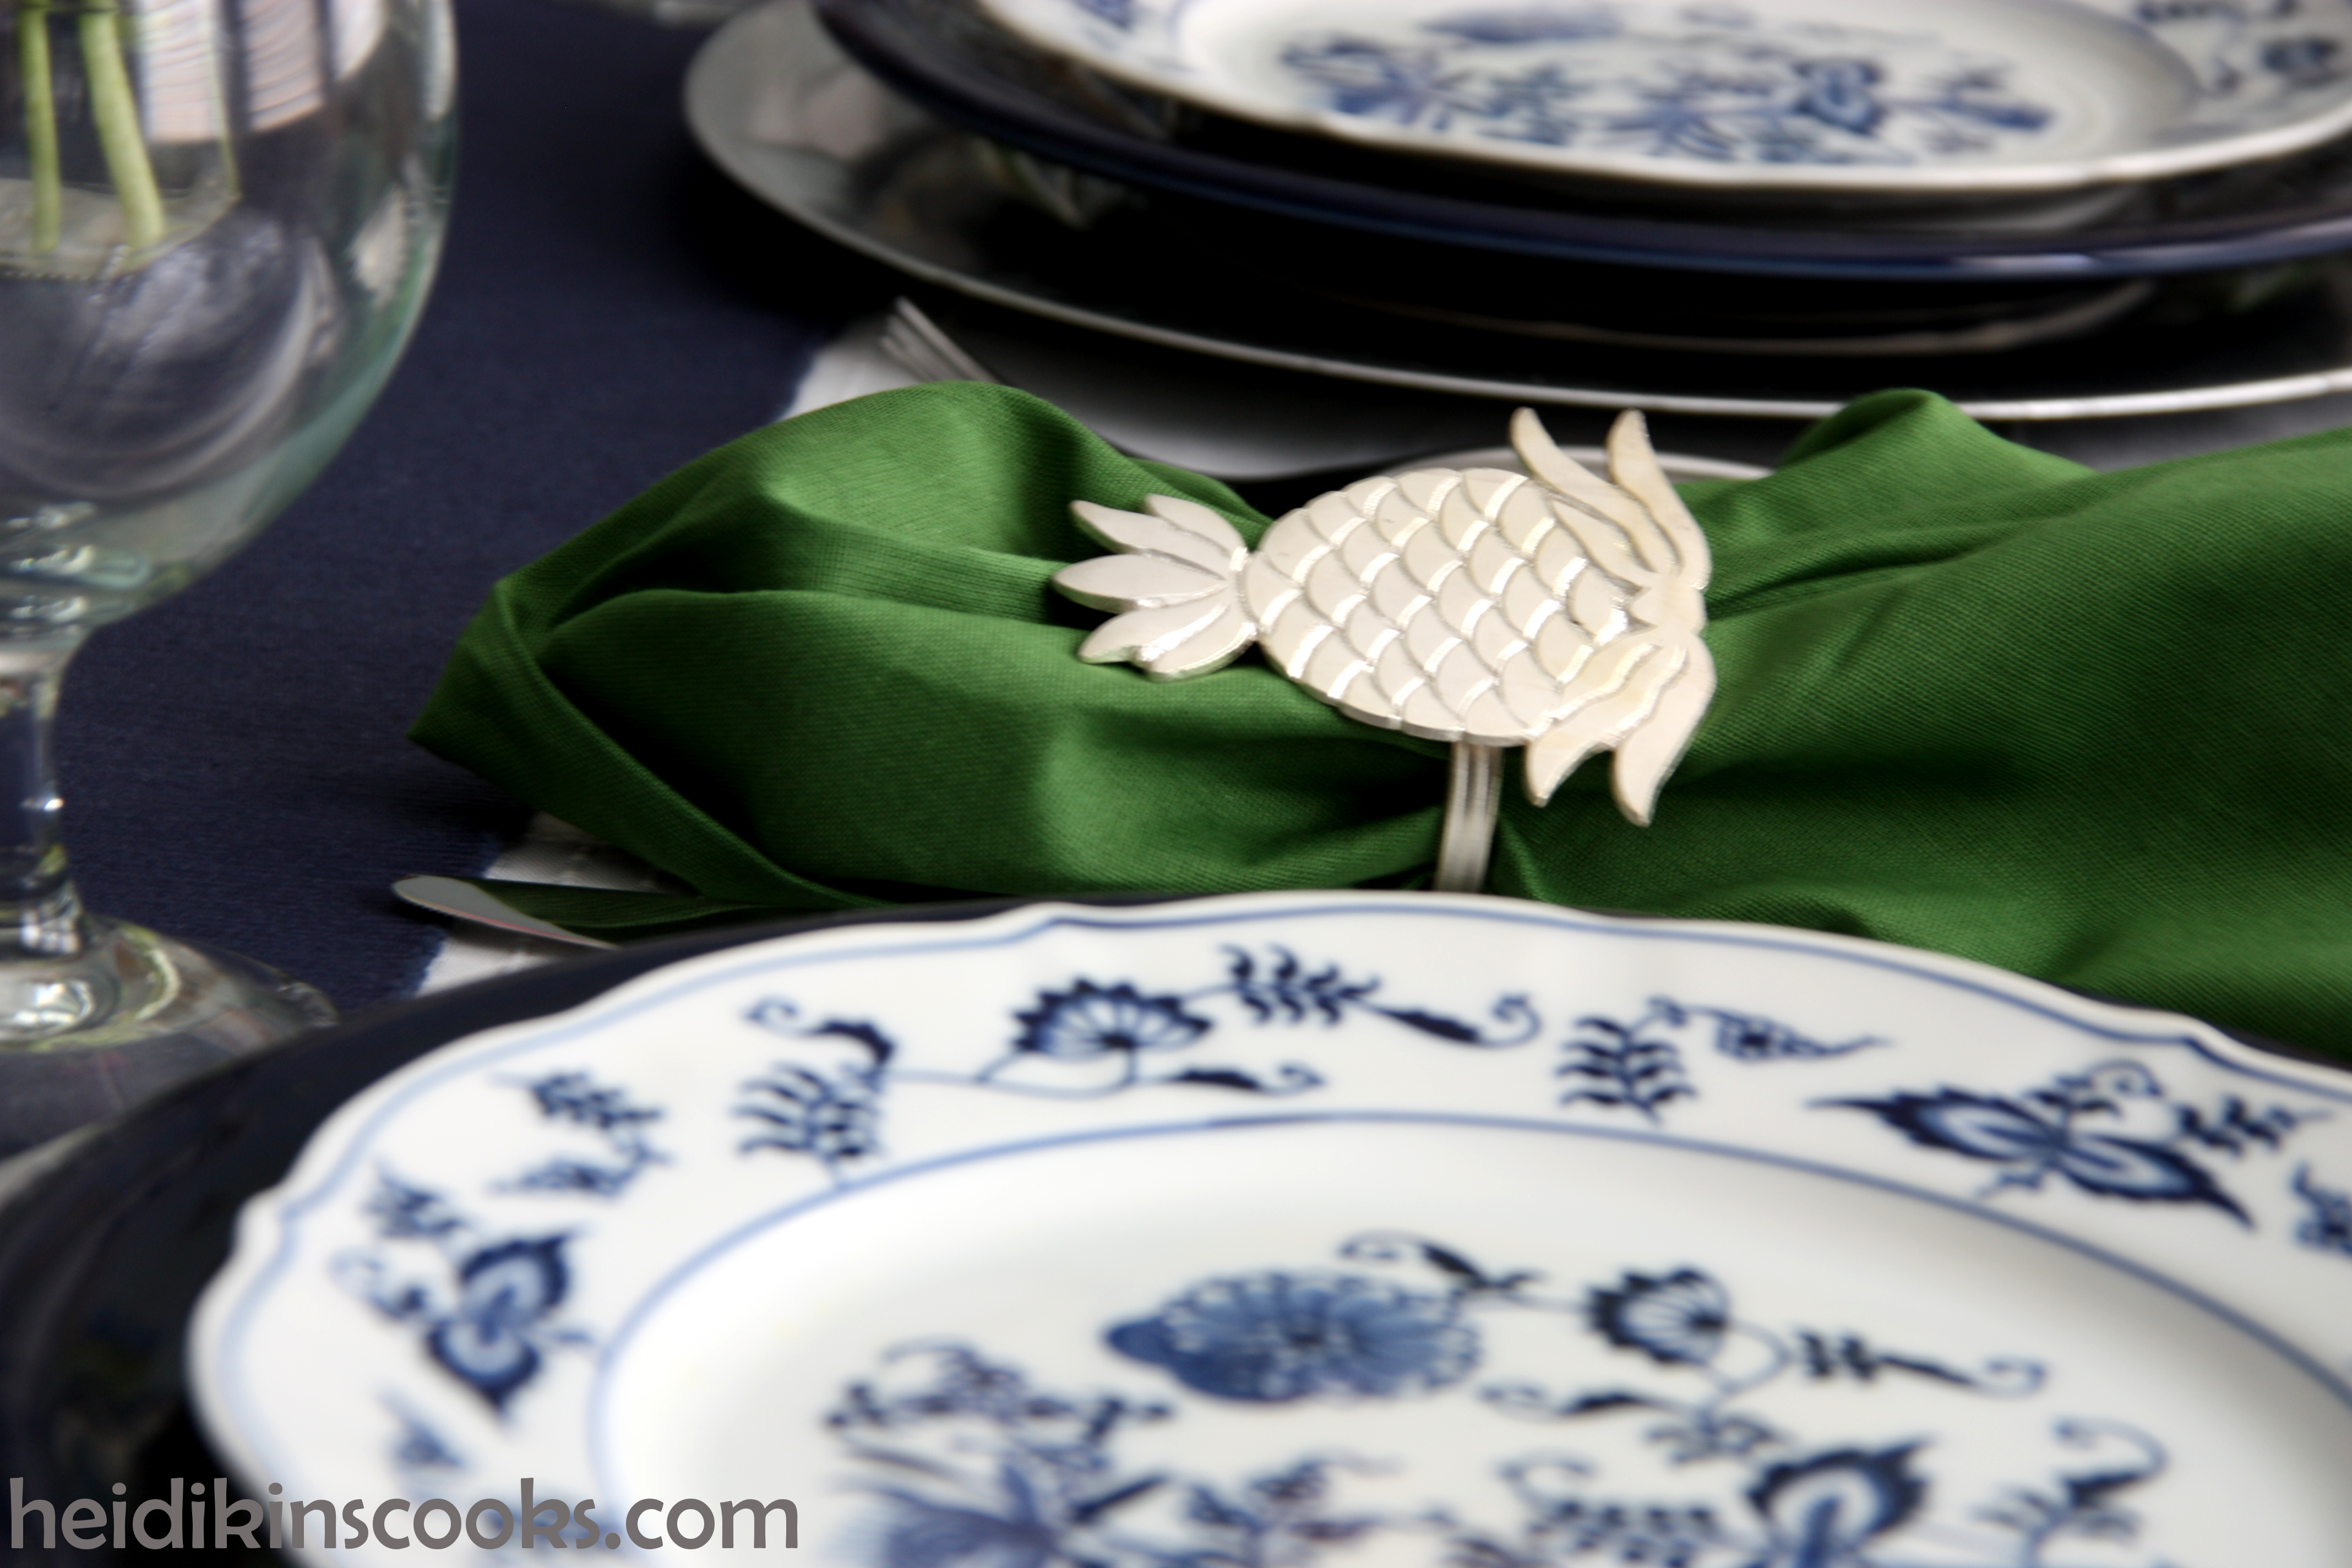 heidikinscooks_Blue Danube Fiesta table setting tablescape_january 2015 (6) & Blue Danube Table Setting | heidikins cooks